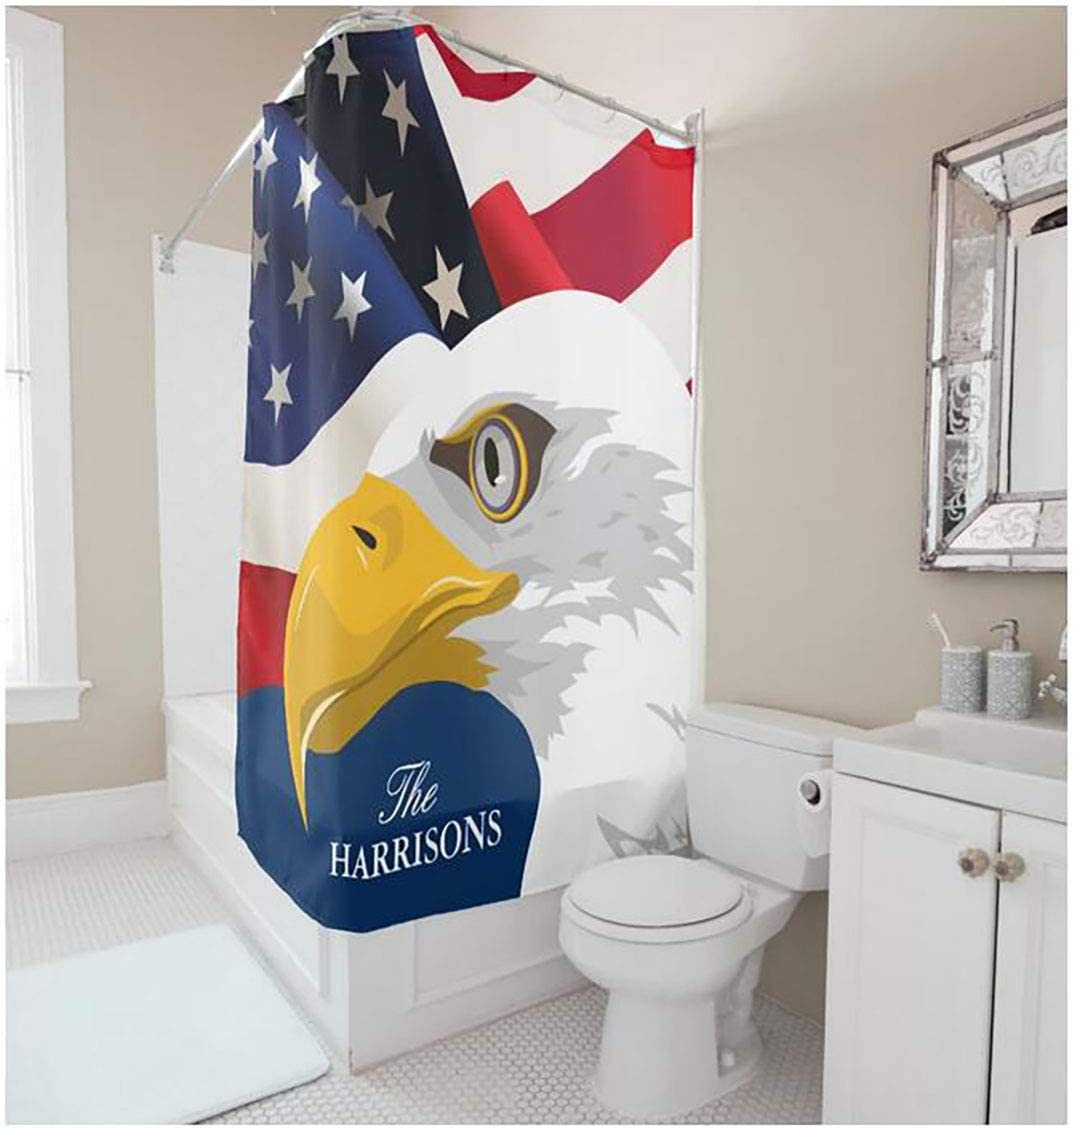 Hillhead Cortina de Ducha, Estampado de águila de poliéster, baño Impermeable, Cortina de Moho, mampara Sanitaria (Size : 165 * 180): Amazon.es: Hogar